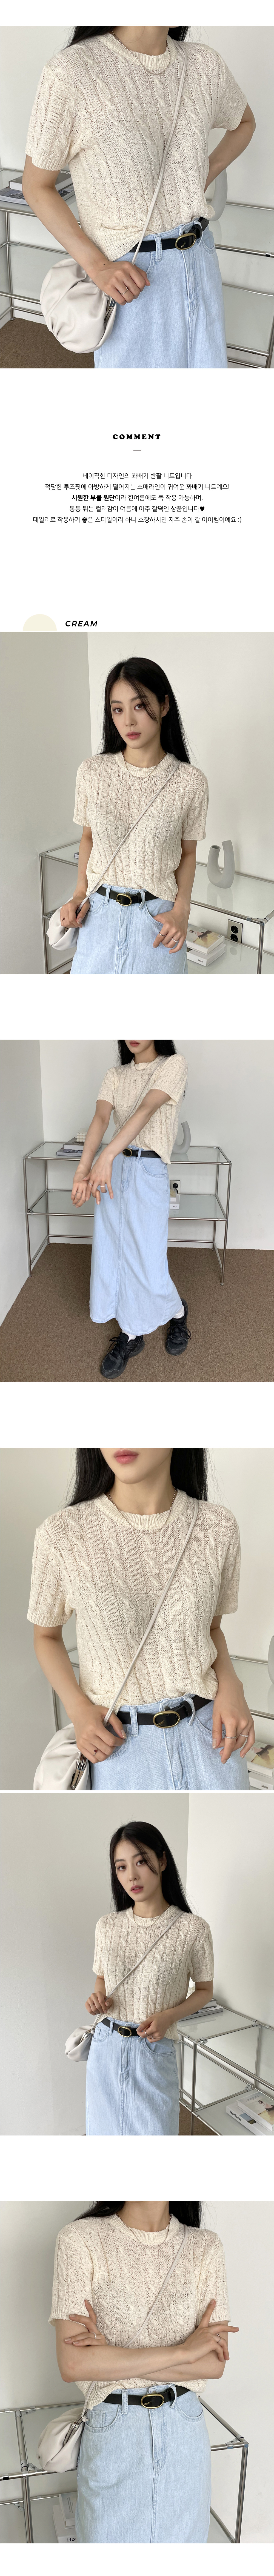 Peacon Summer Twisted Bouquet Short Sleeve Knitwear